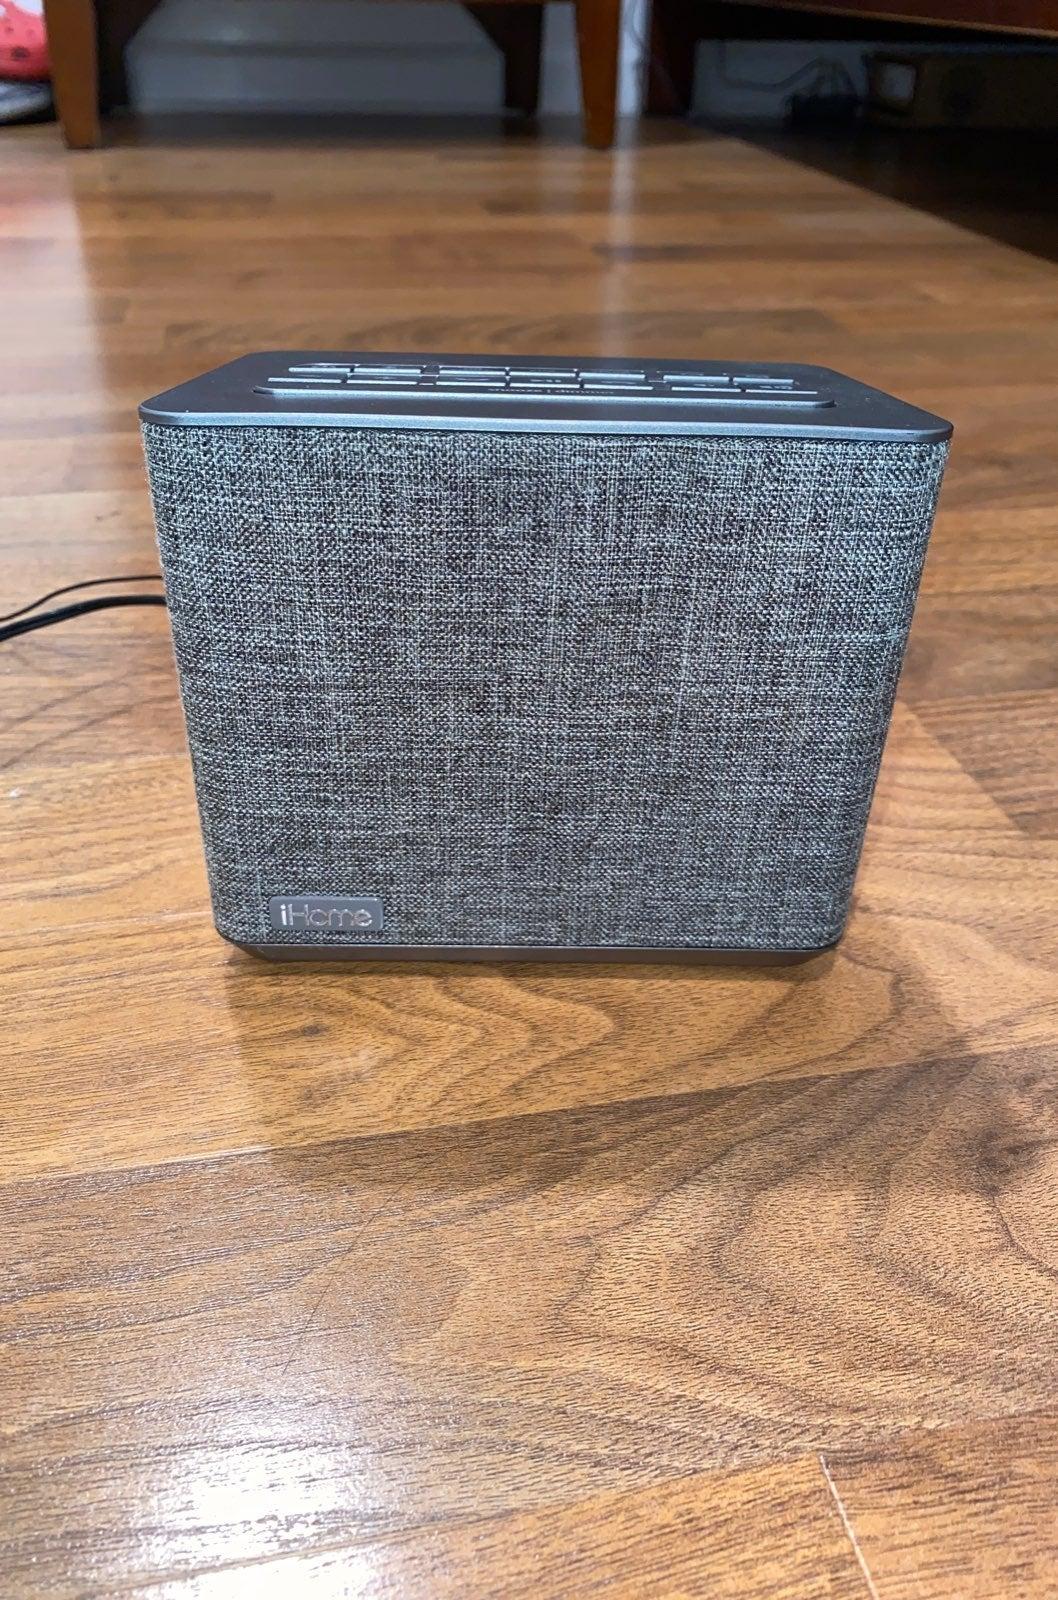 iHome Wireless Alarm Clock/Radio/Speaker